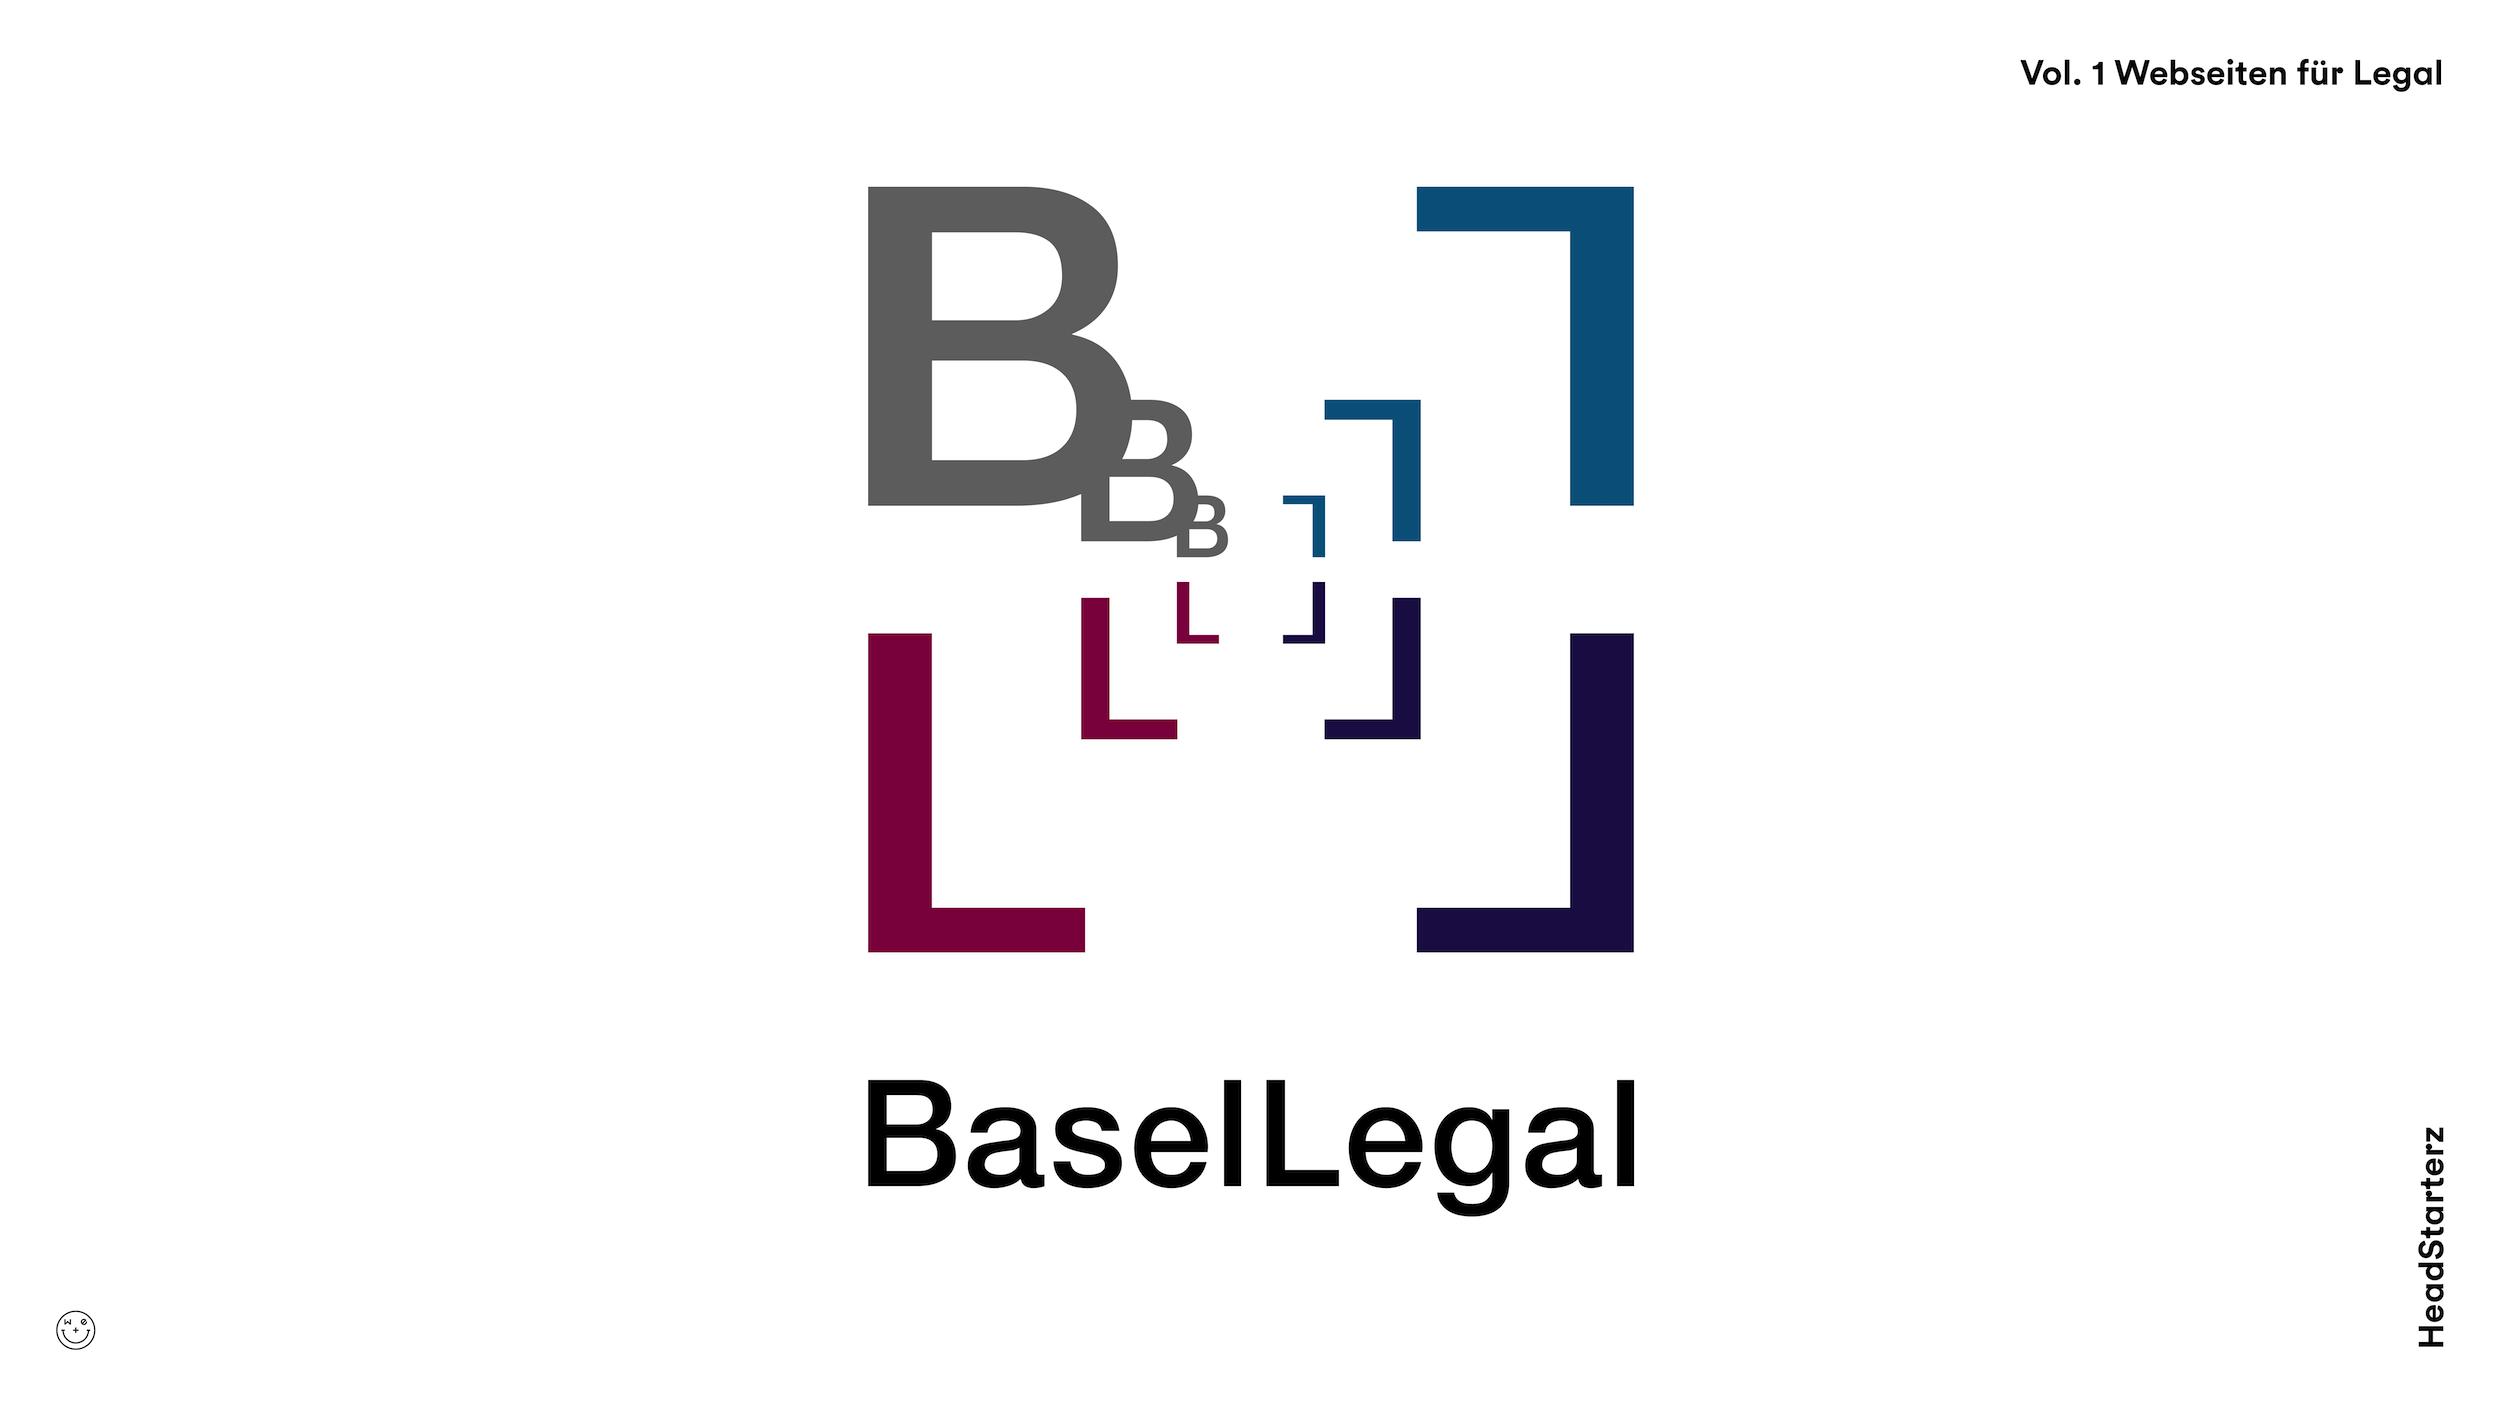 Basel Legal